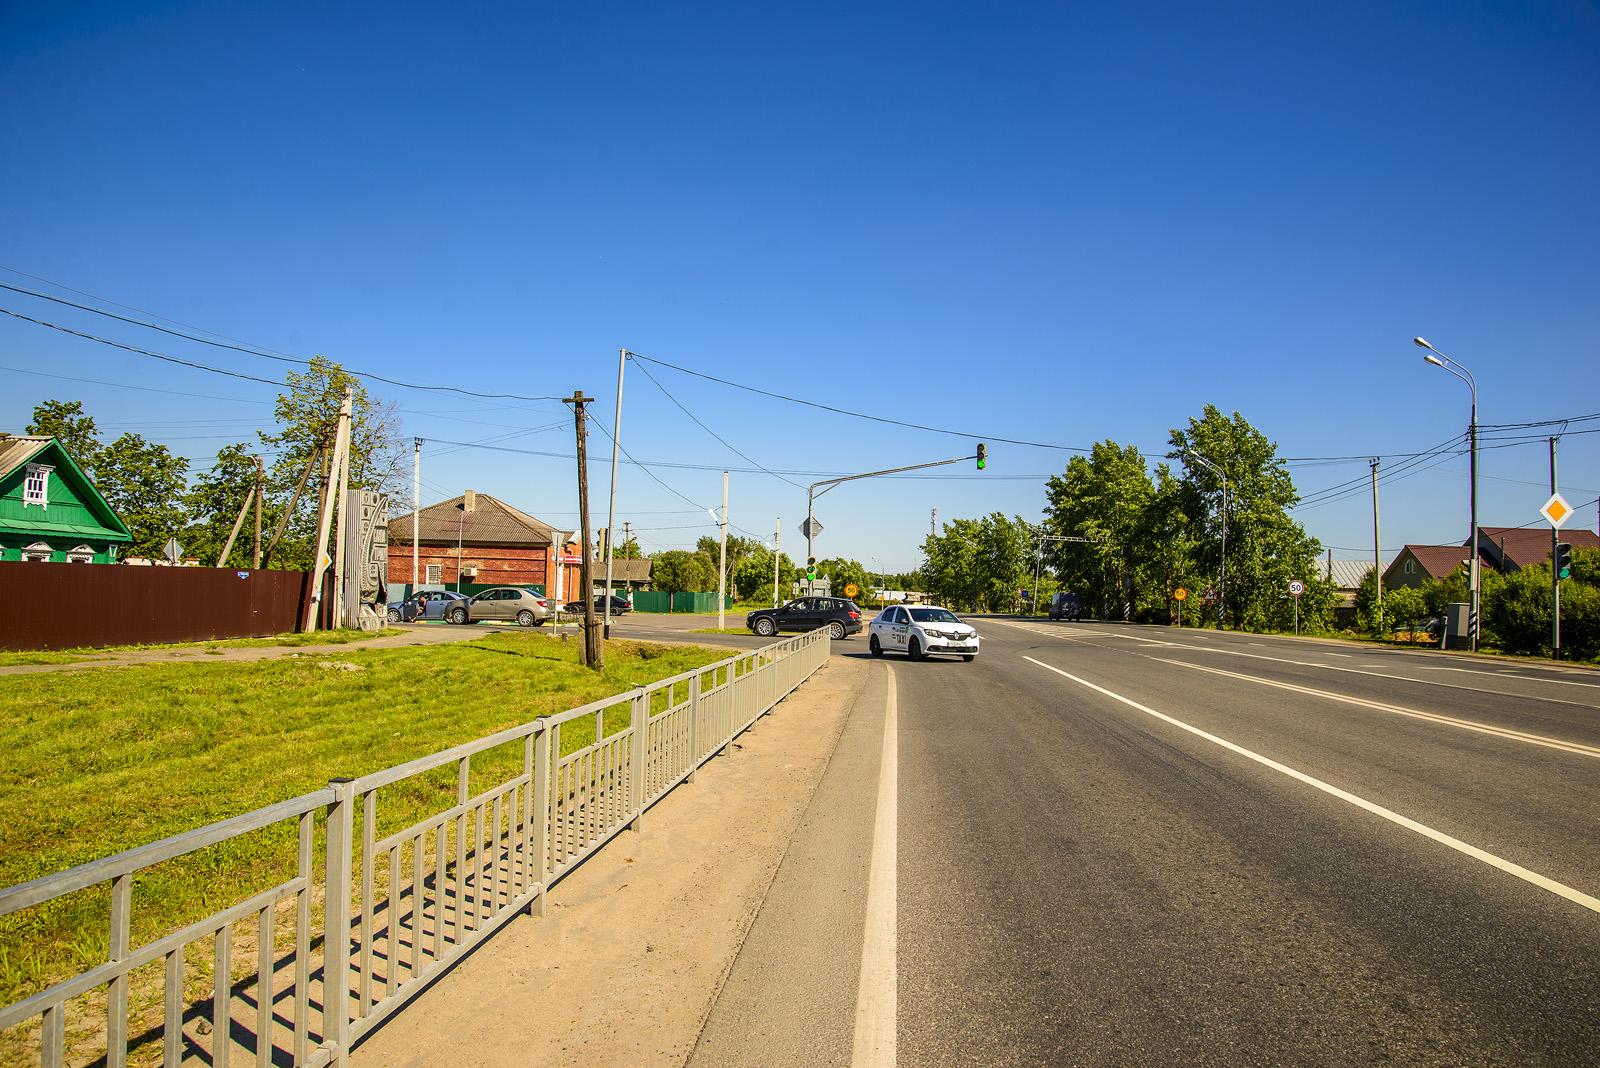 Светофор на повороте к Морозово